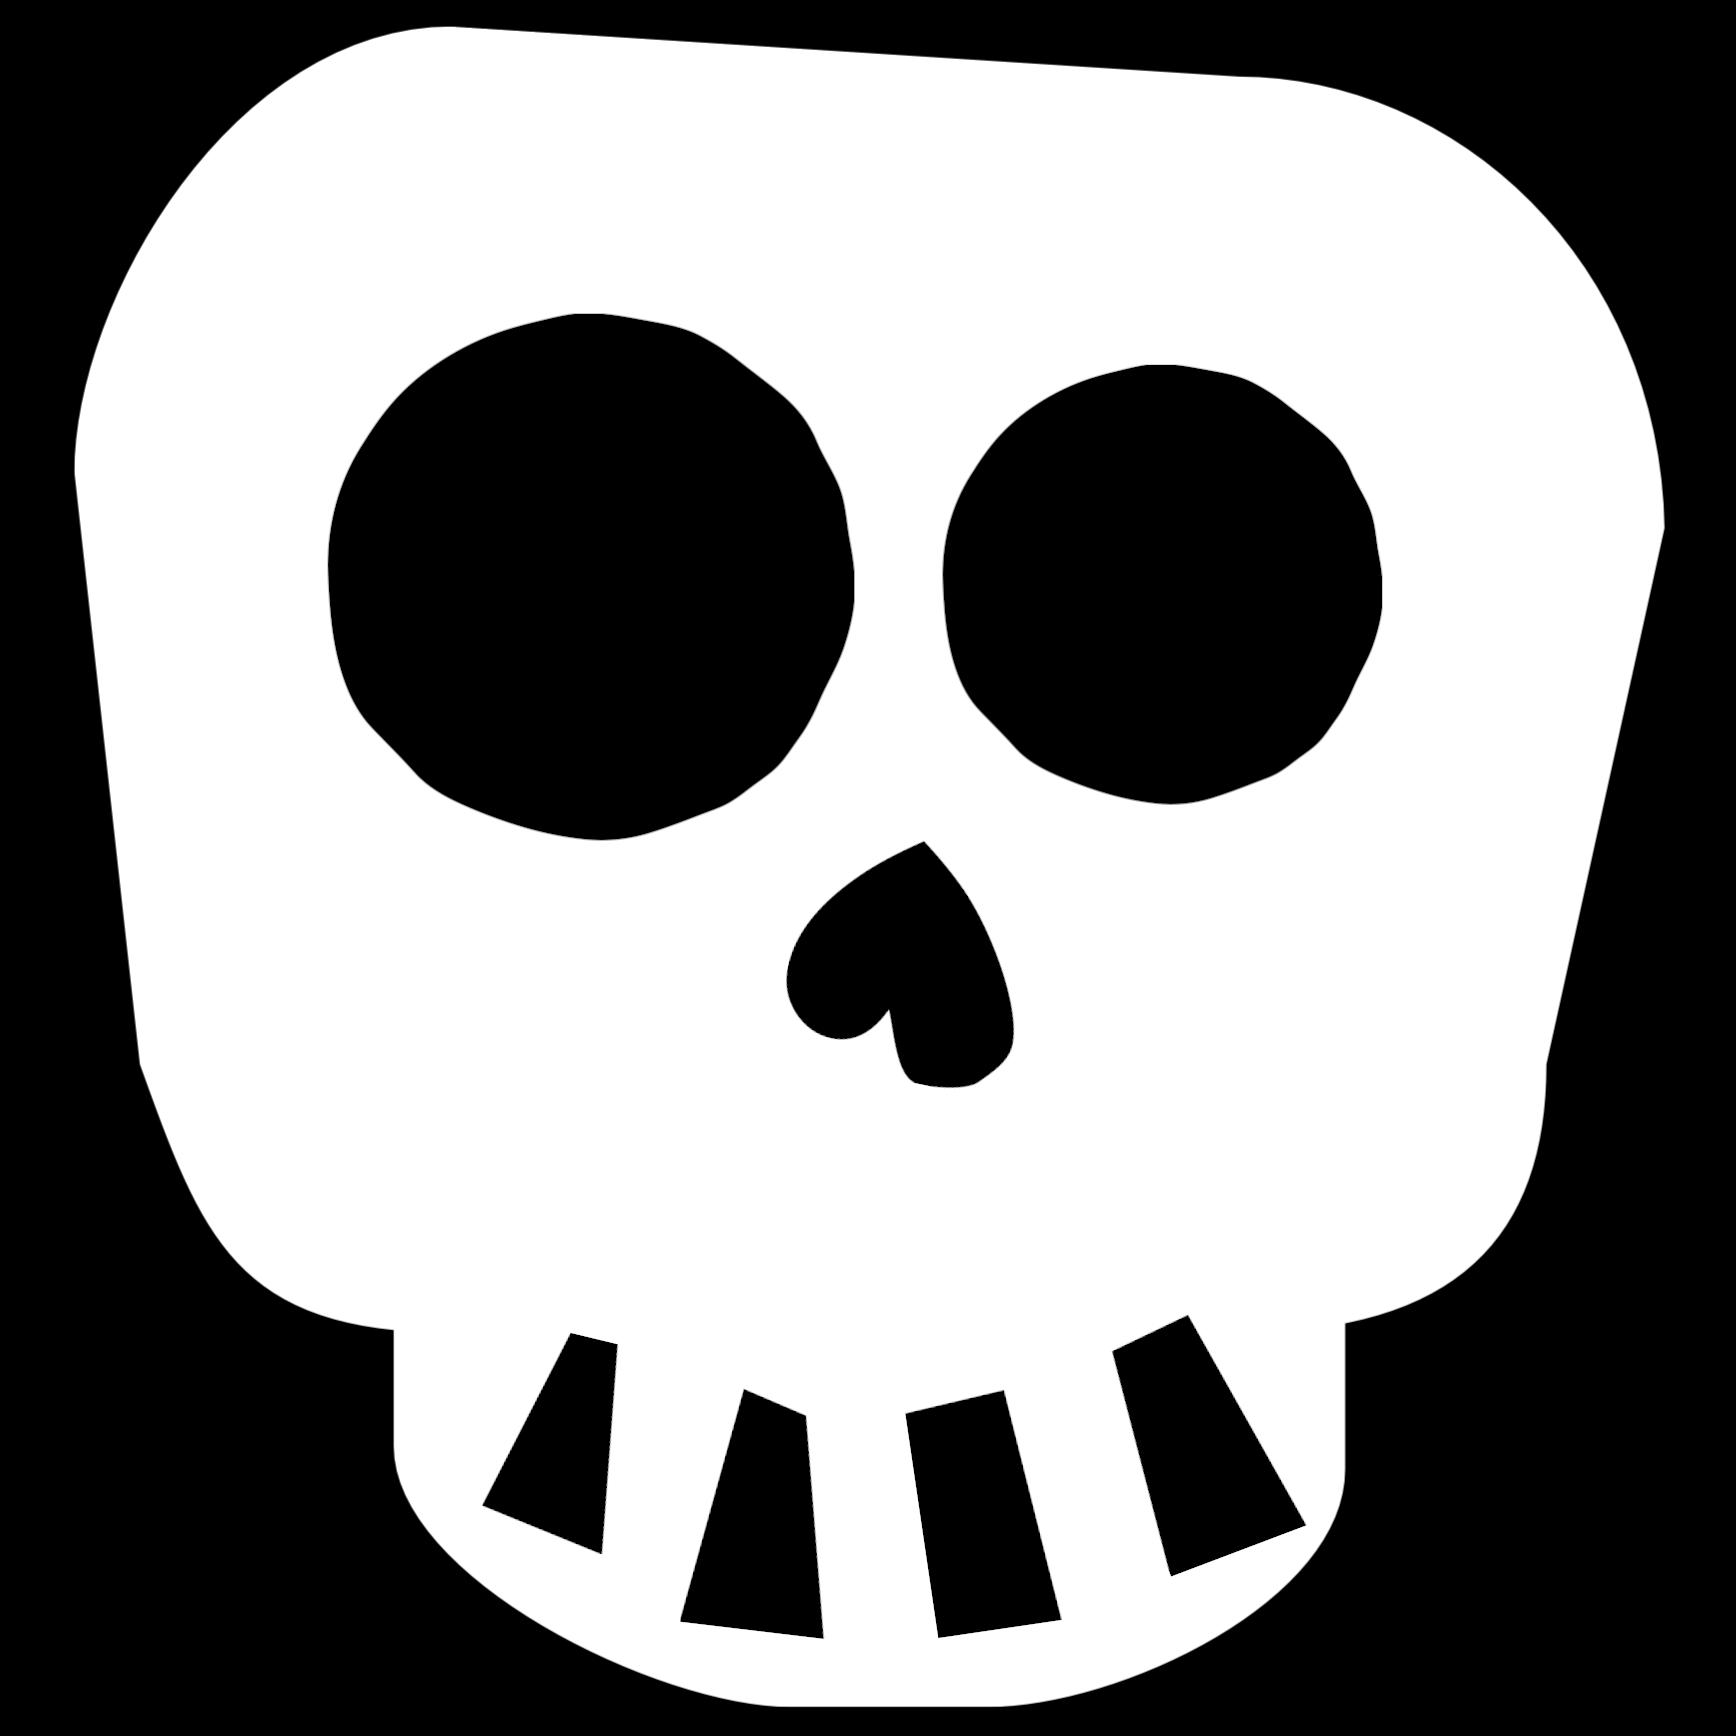 free printable halloween skull decoration banner halloween or day of the dead banner printable template